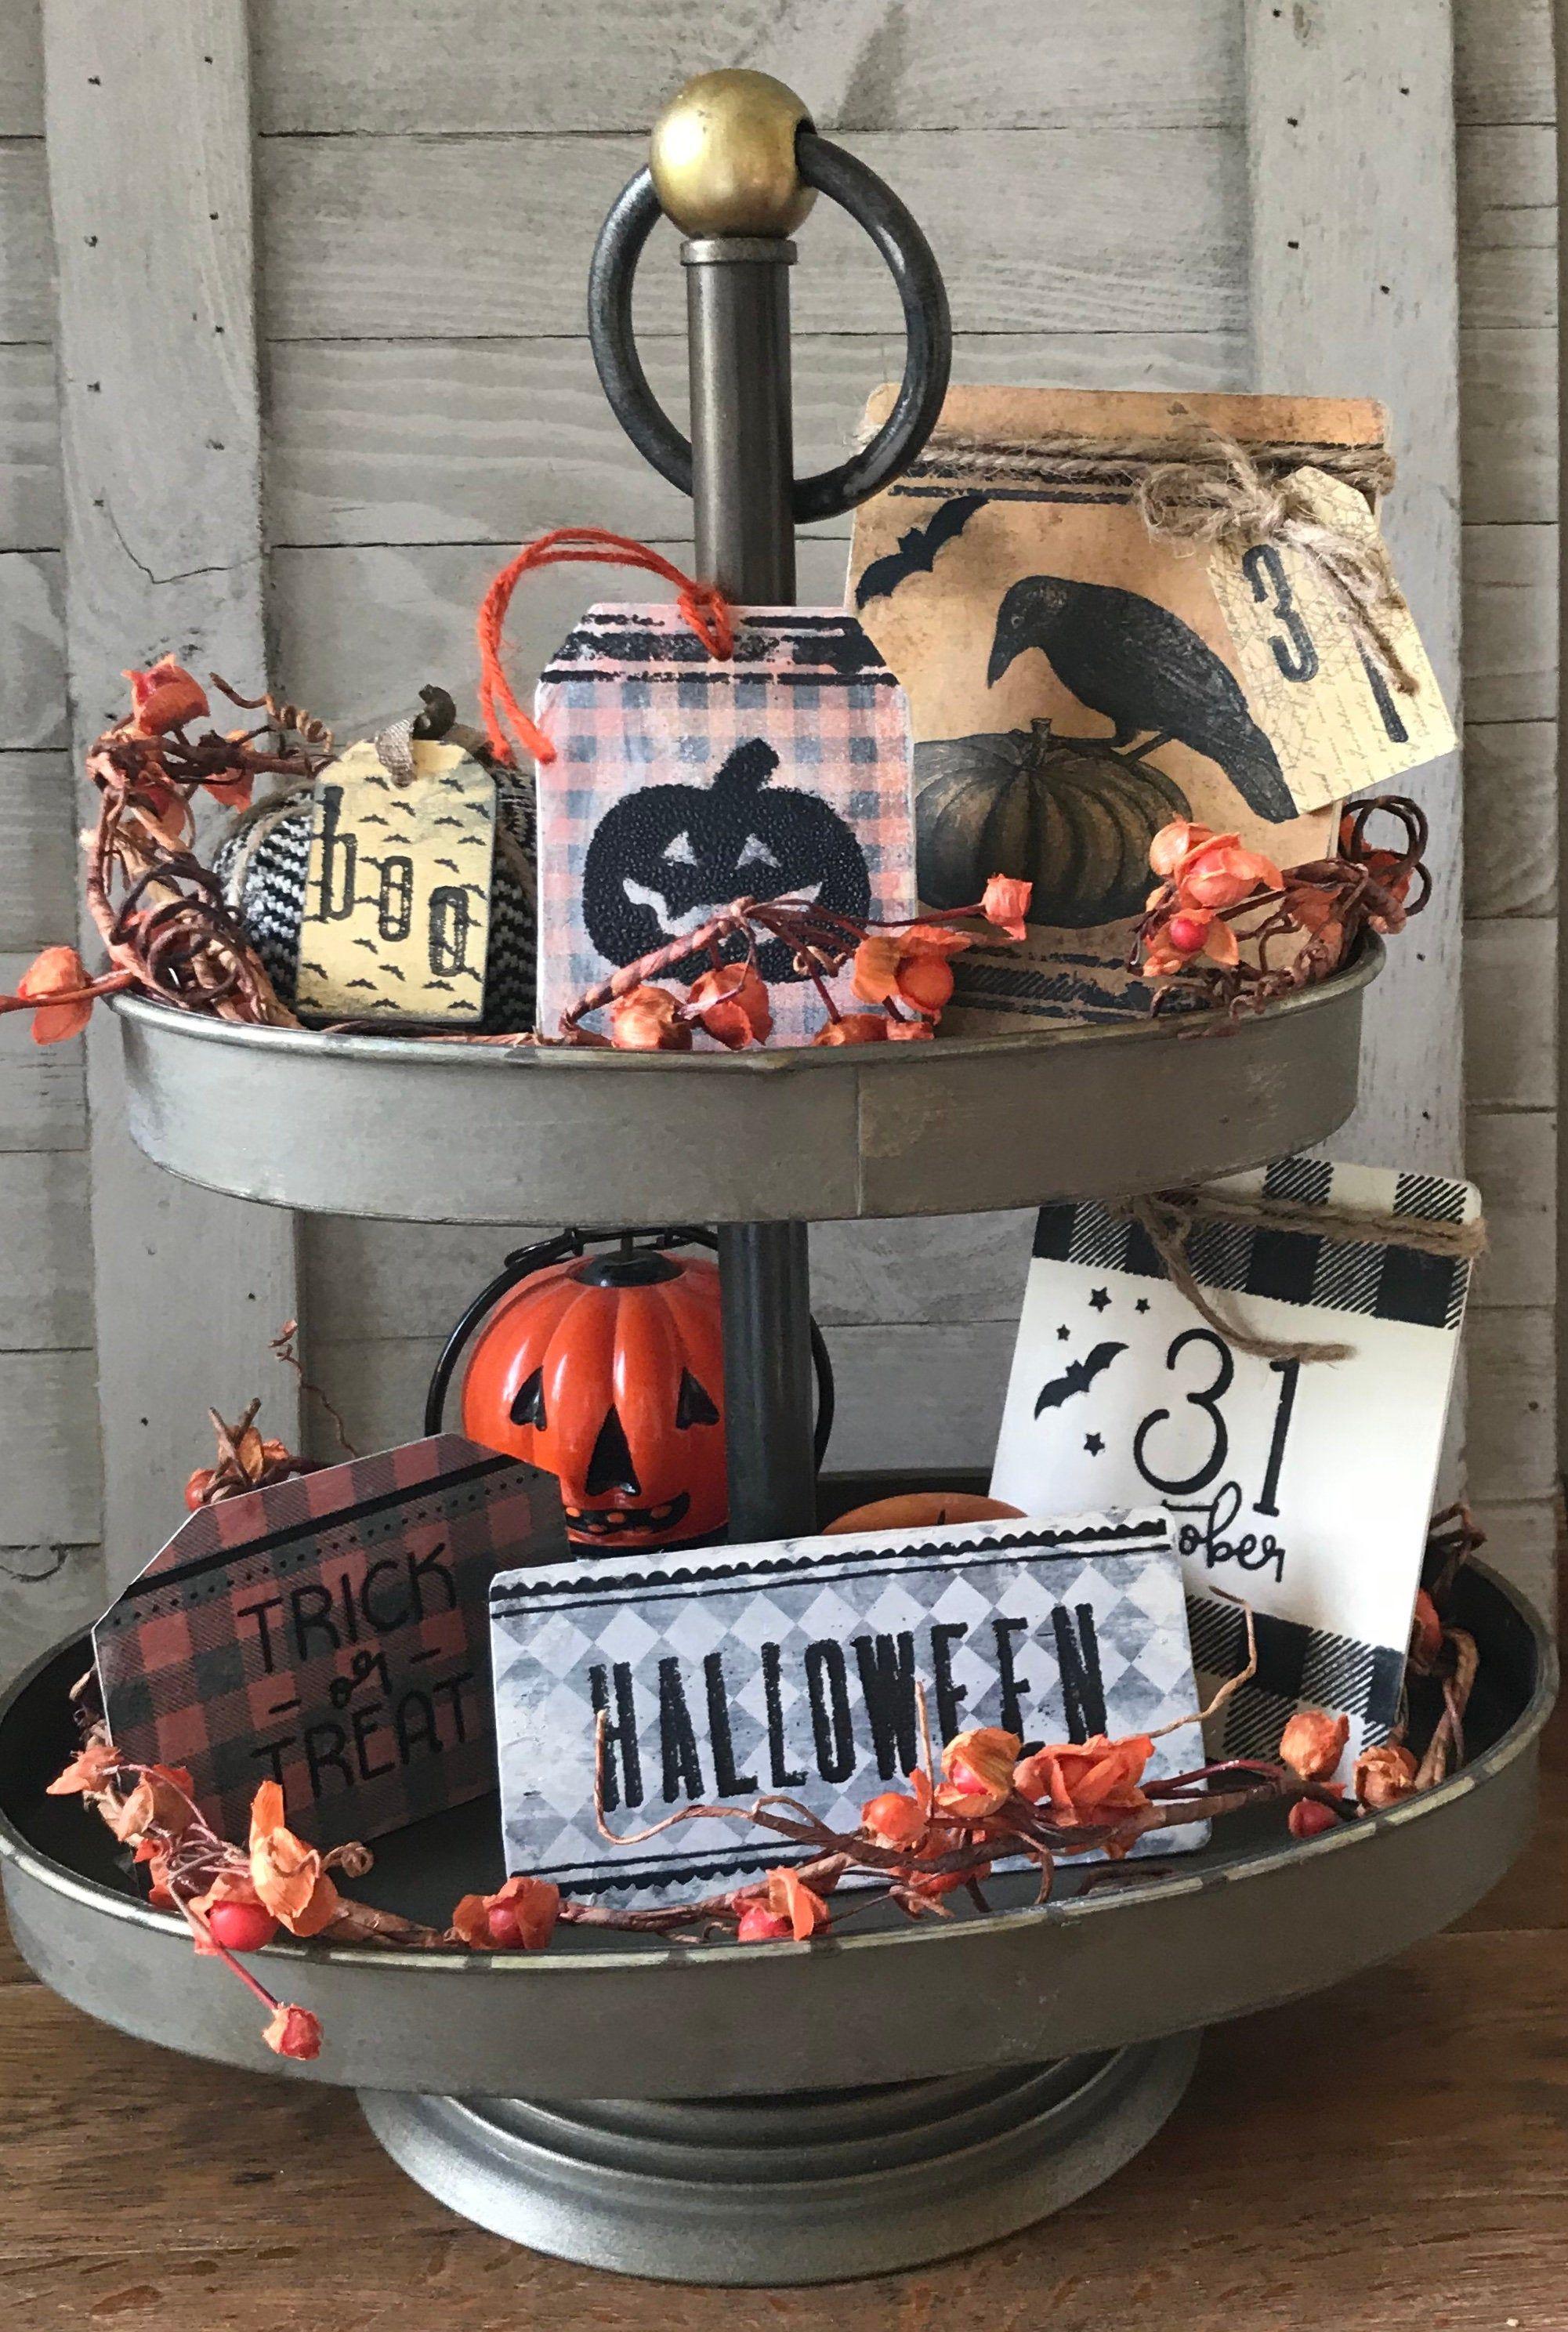 New halo tier list ! Halloween Bundle Tier Tray Decor. Farmhouse Primitive Rustic   Etsy in 2021   Tiered tray decor ...